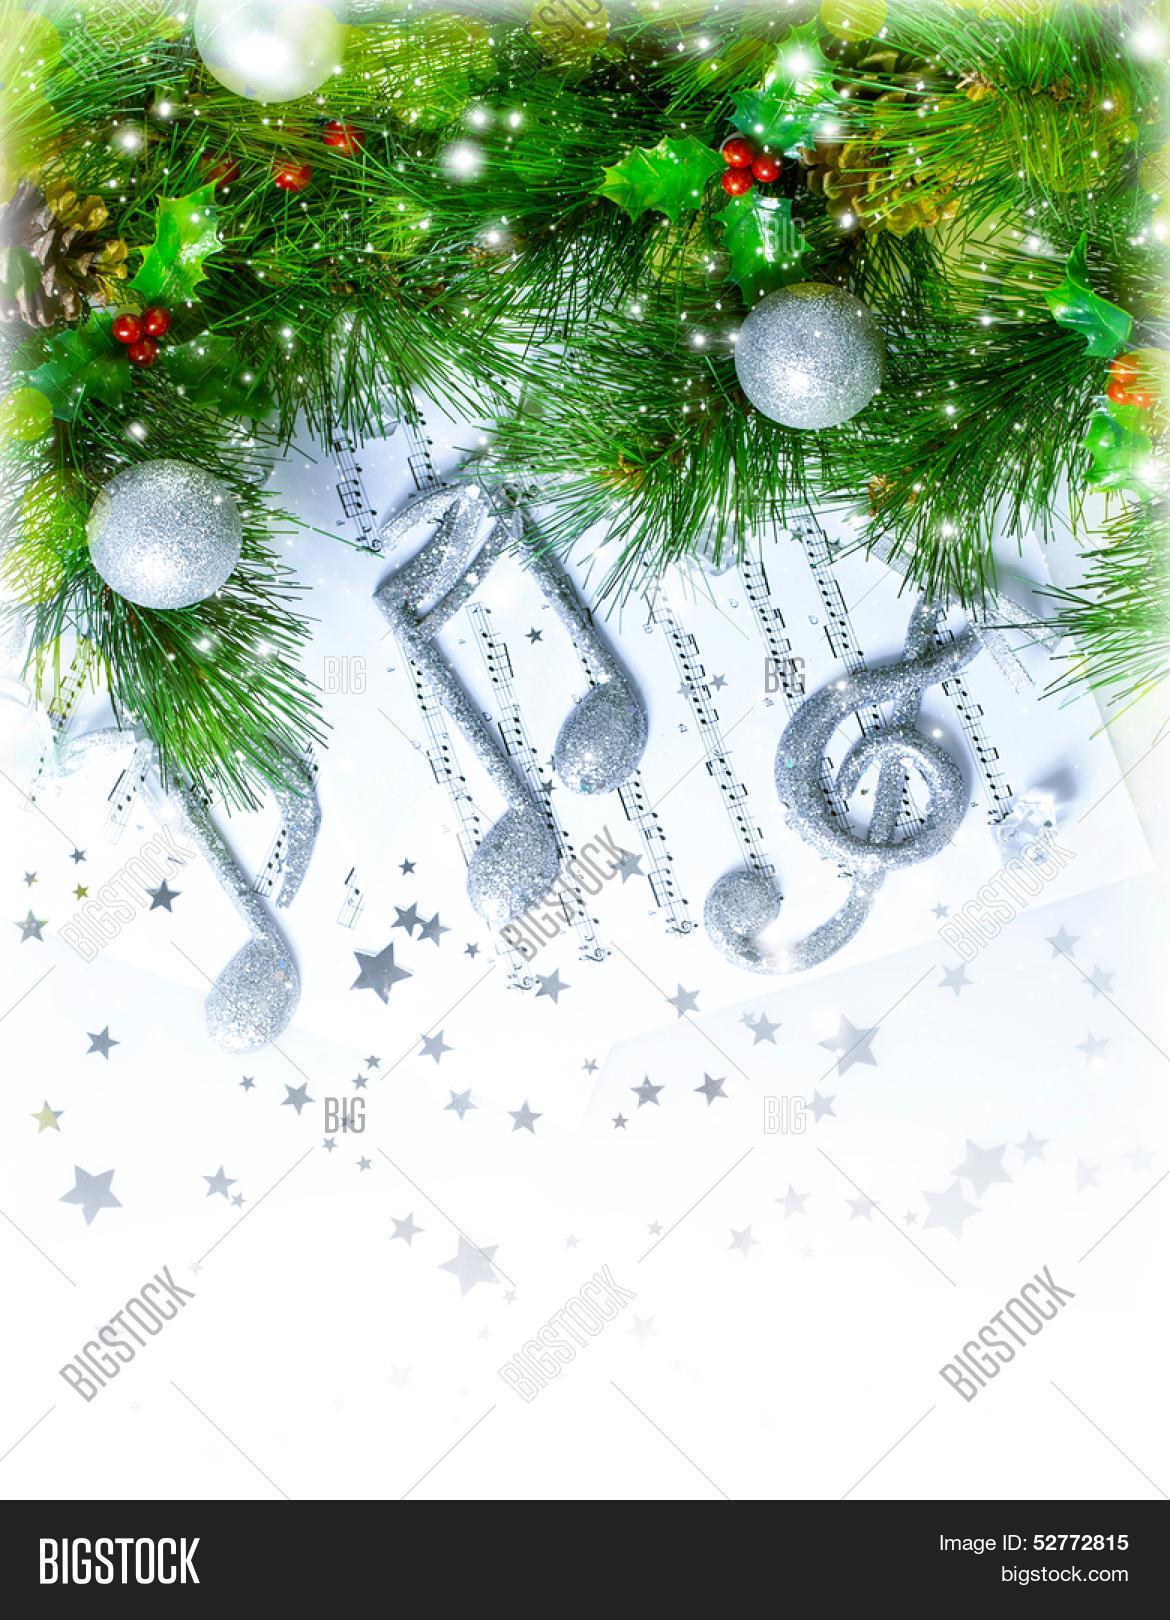 Image Christmas Treble Image & Photo (Free Trial) | Bigstock